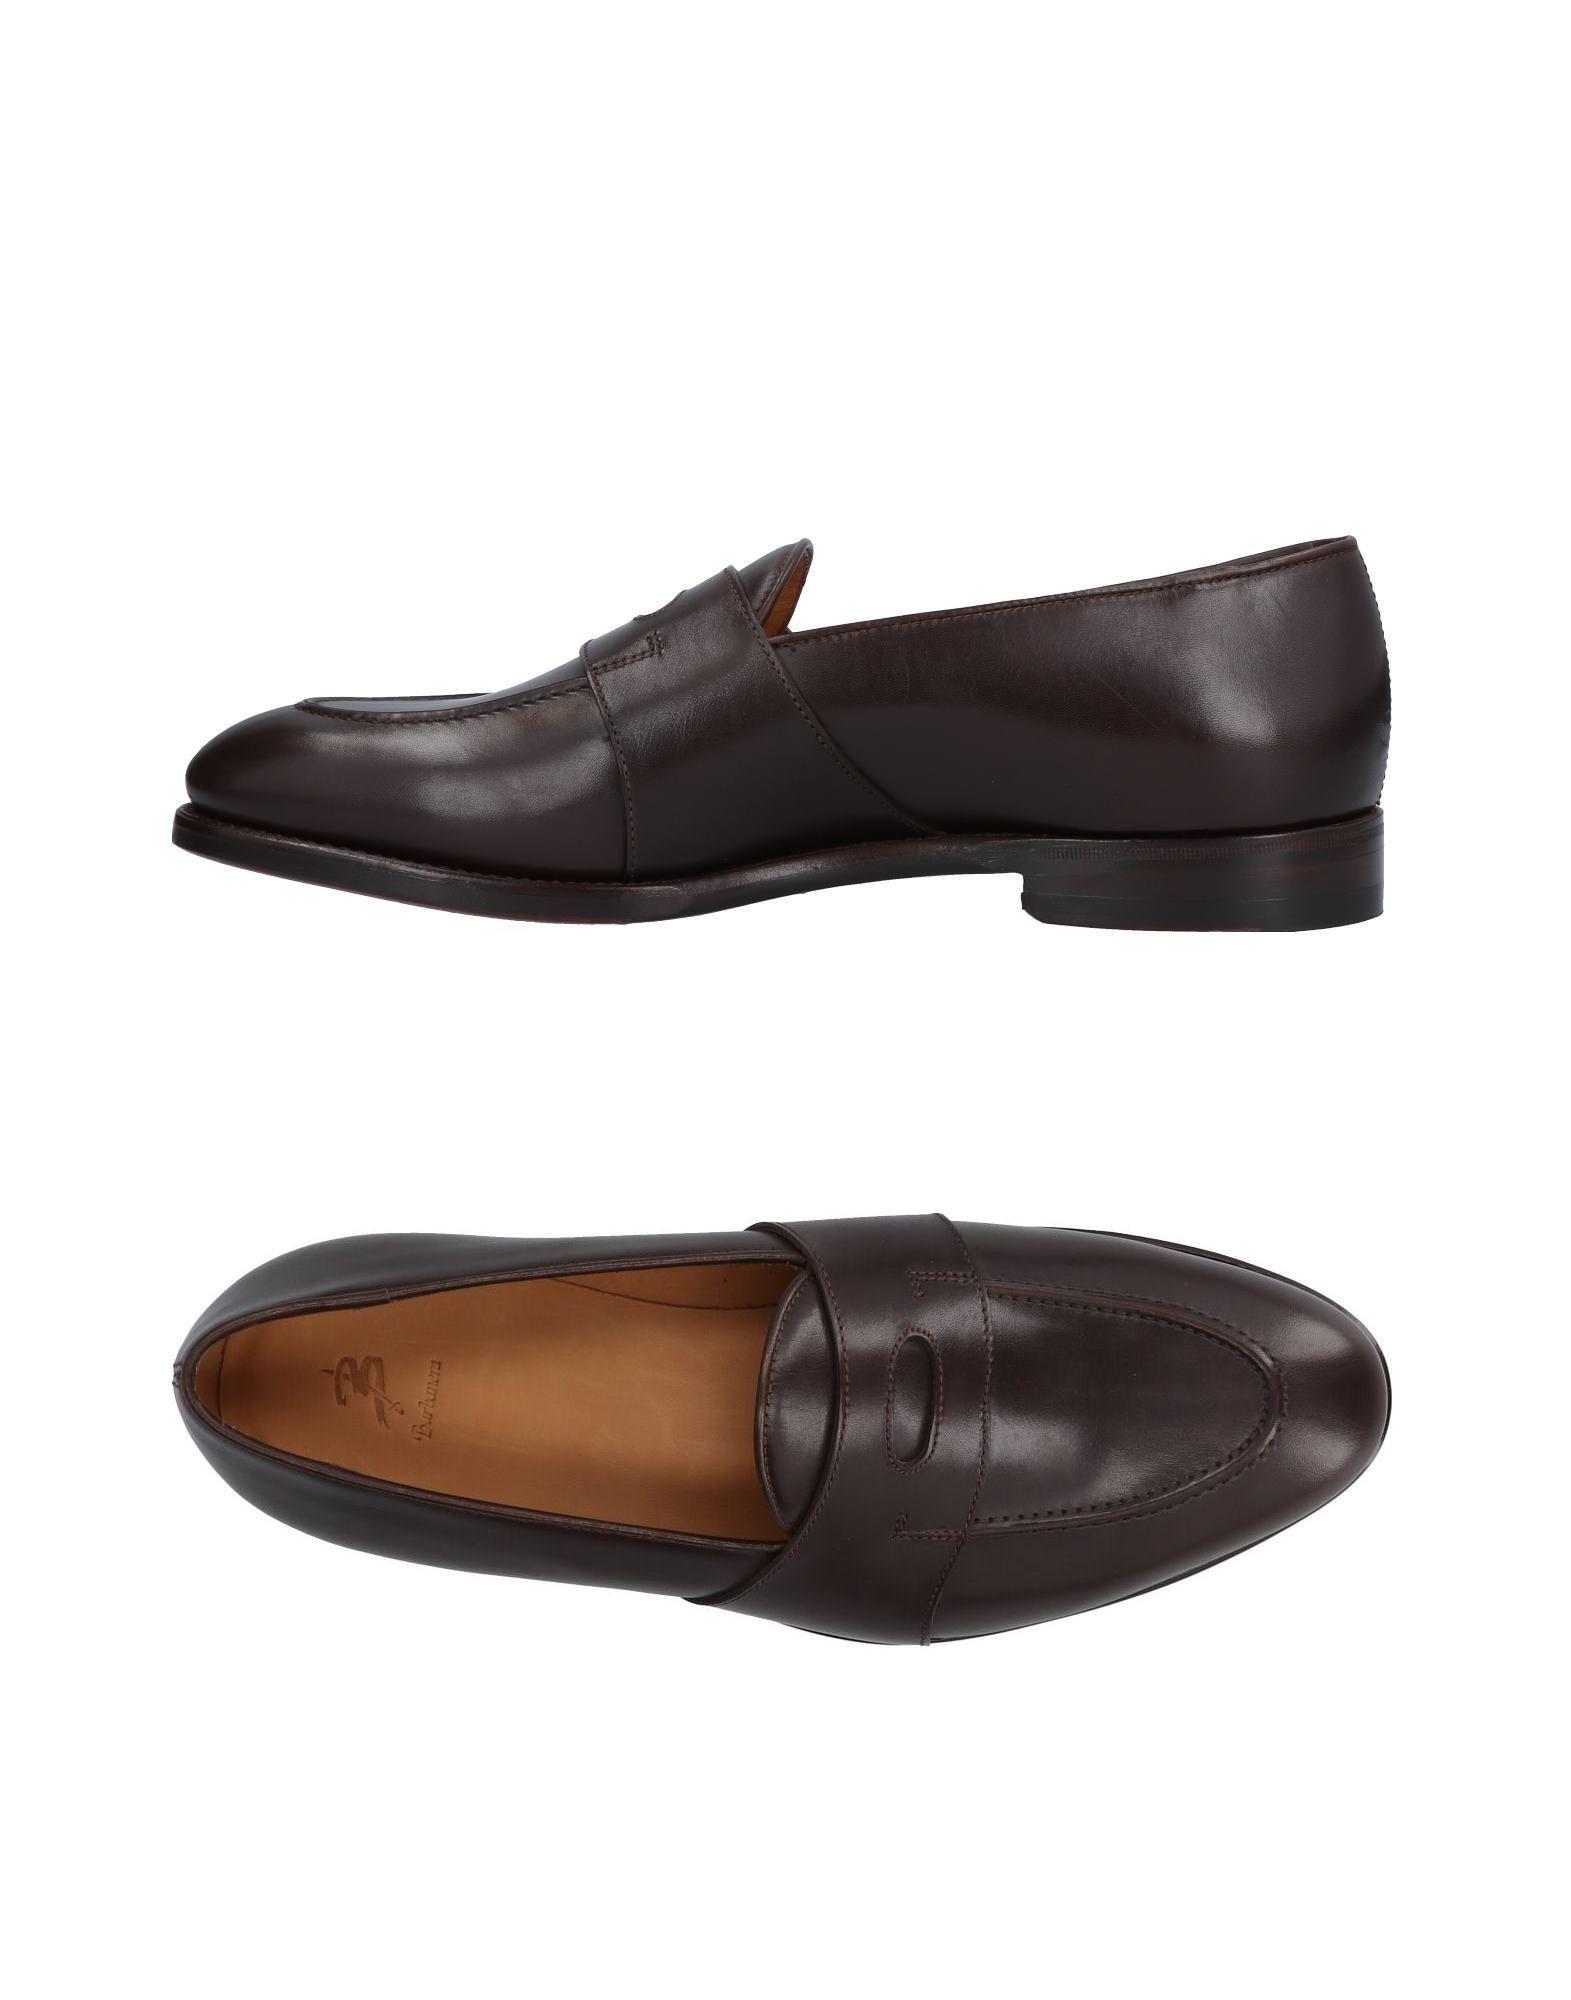 Barbanera Mokassins Qualität Herren  11478187NI Gute Qualität Mokassins beliebte Schuhe 4c68a3